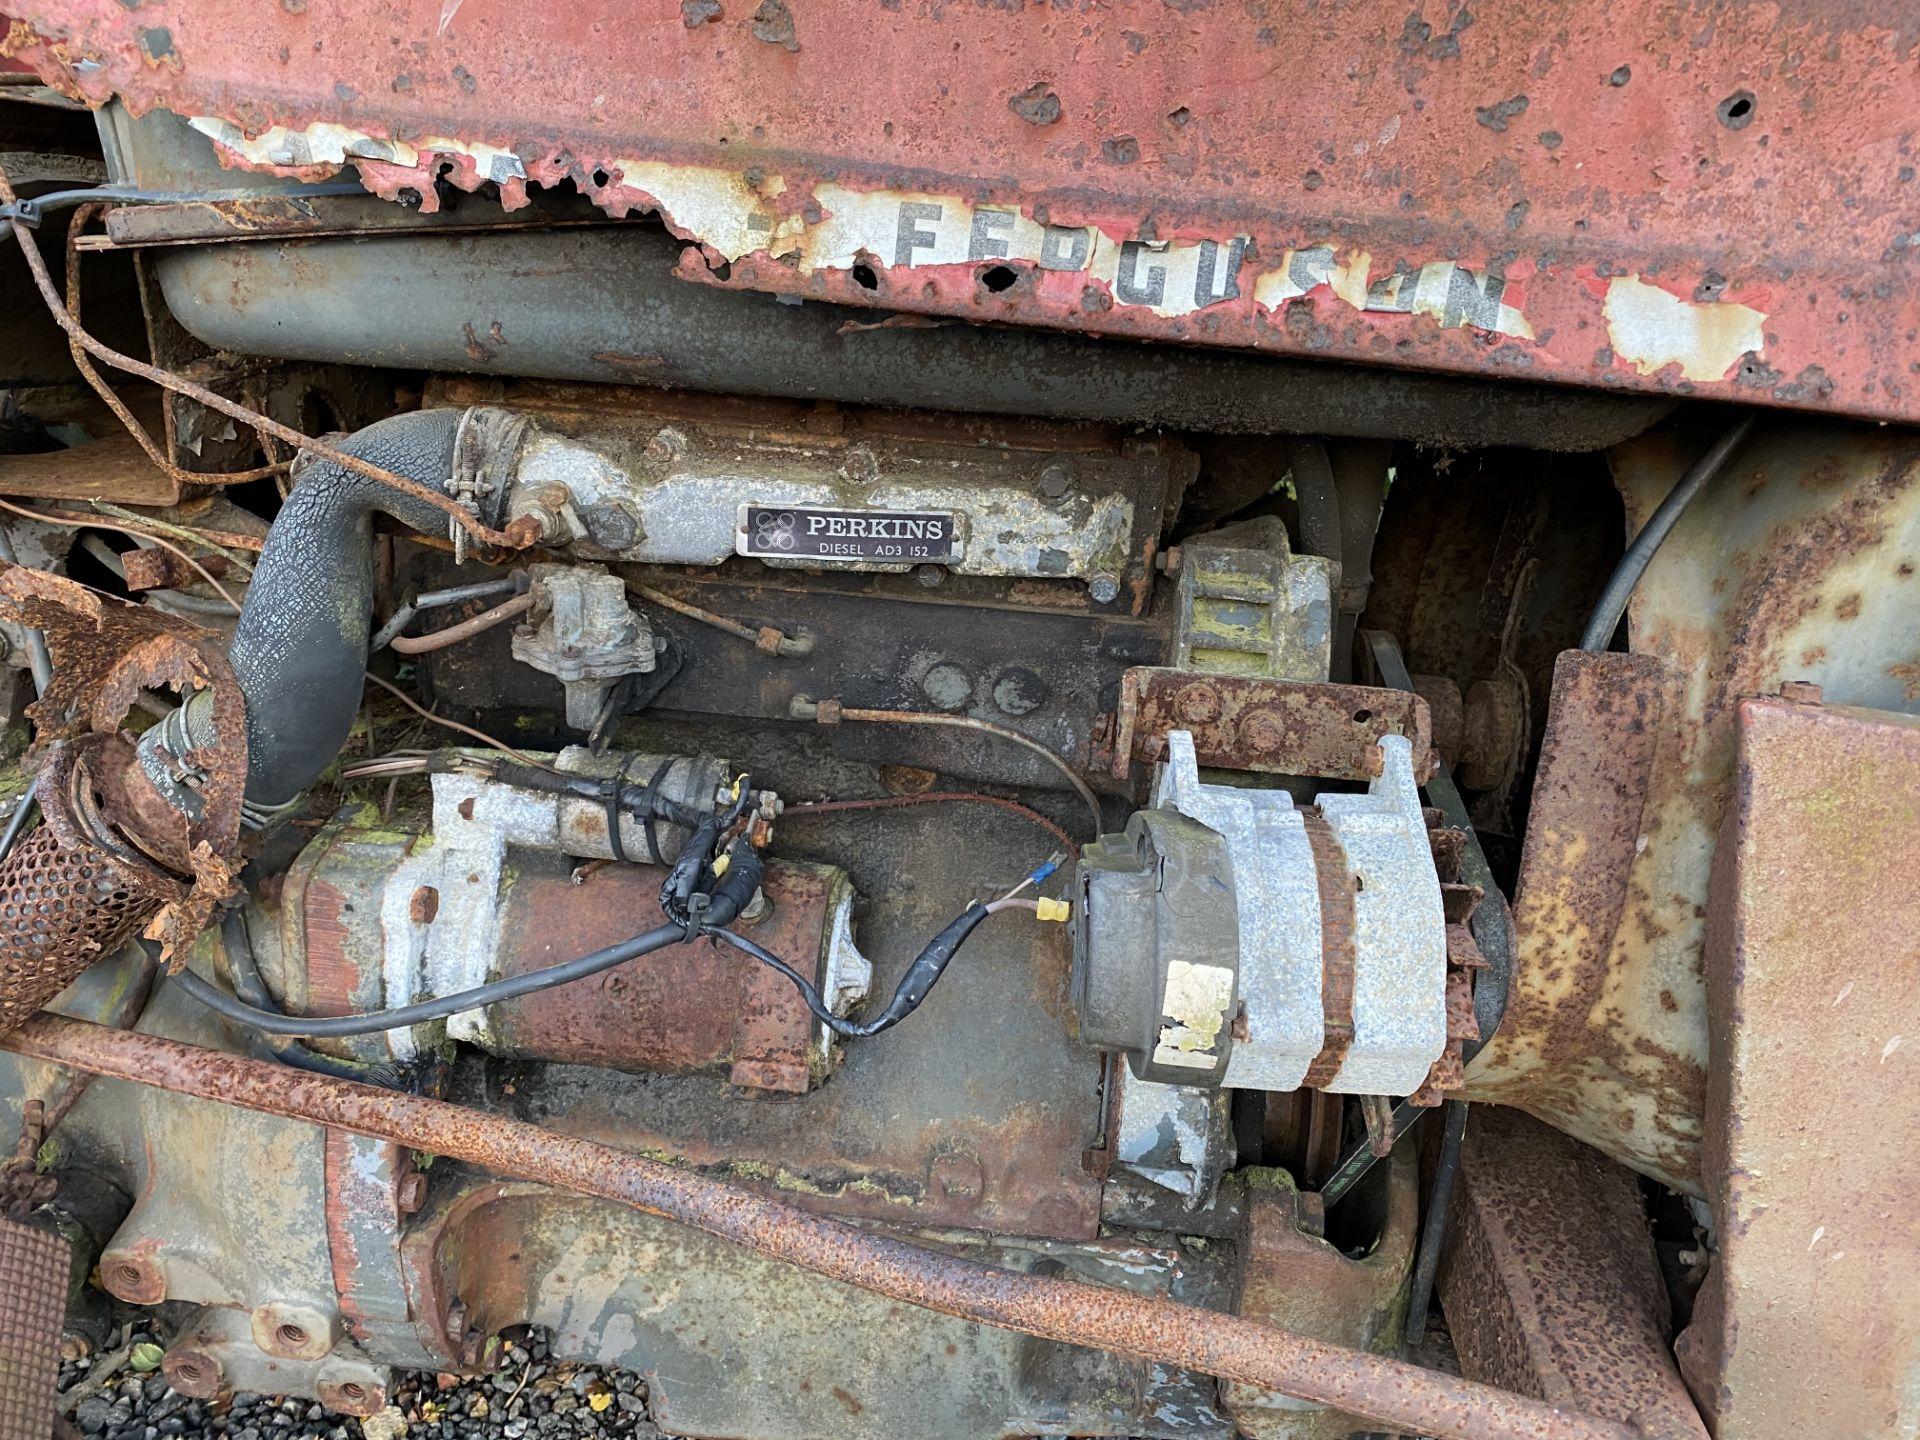 MASSEY FERGUSON 135, DIESEL 3 CYLINDER PERKINS ENGINE, IN NEED OF RESTORATION, LOADING NO PROBLEM - Image 3 of 3